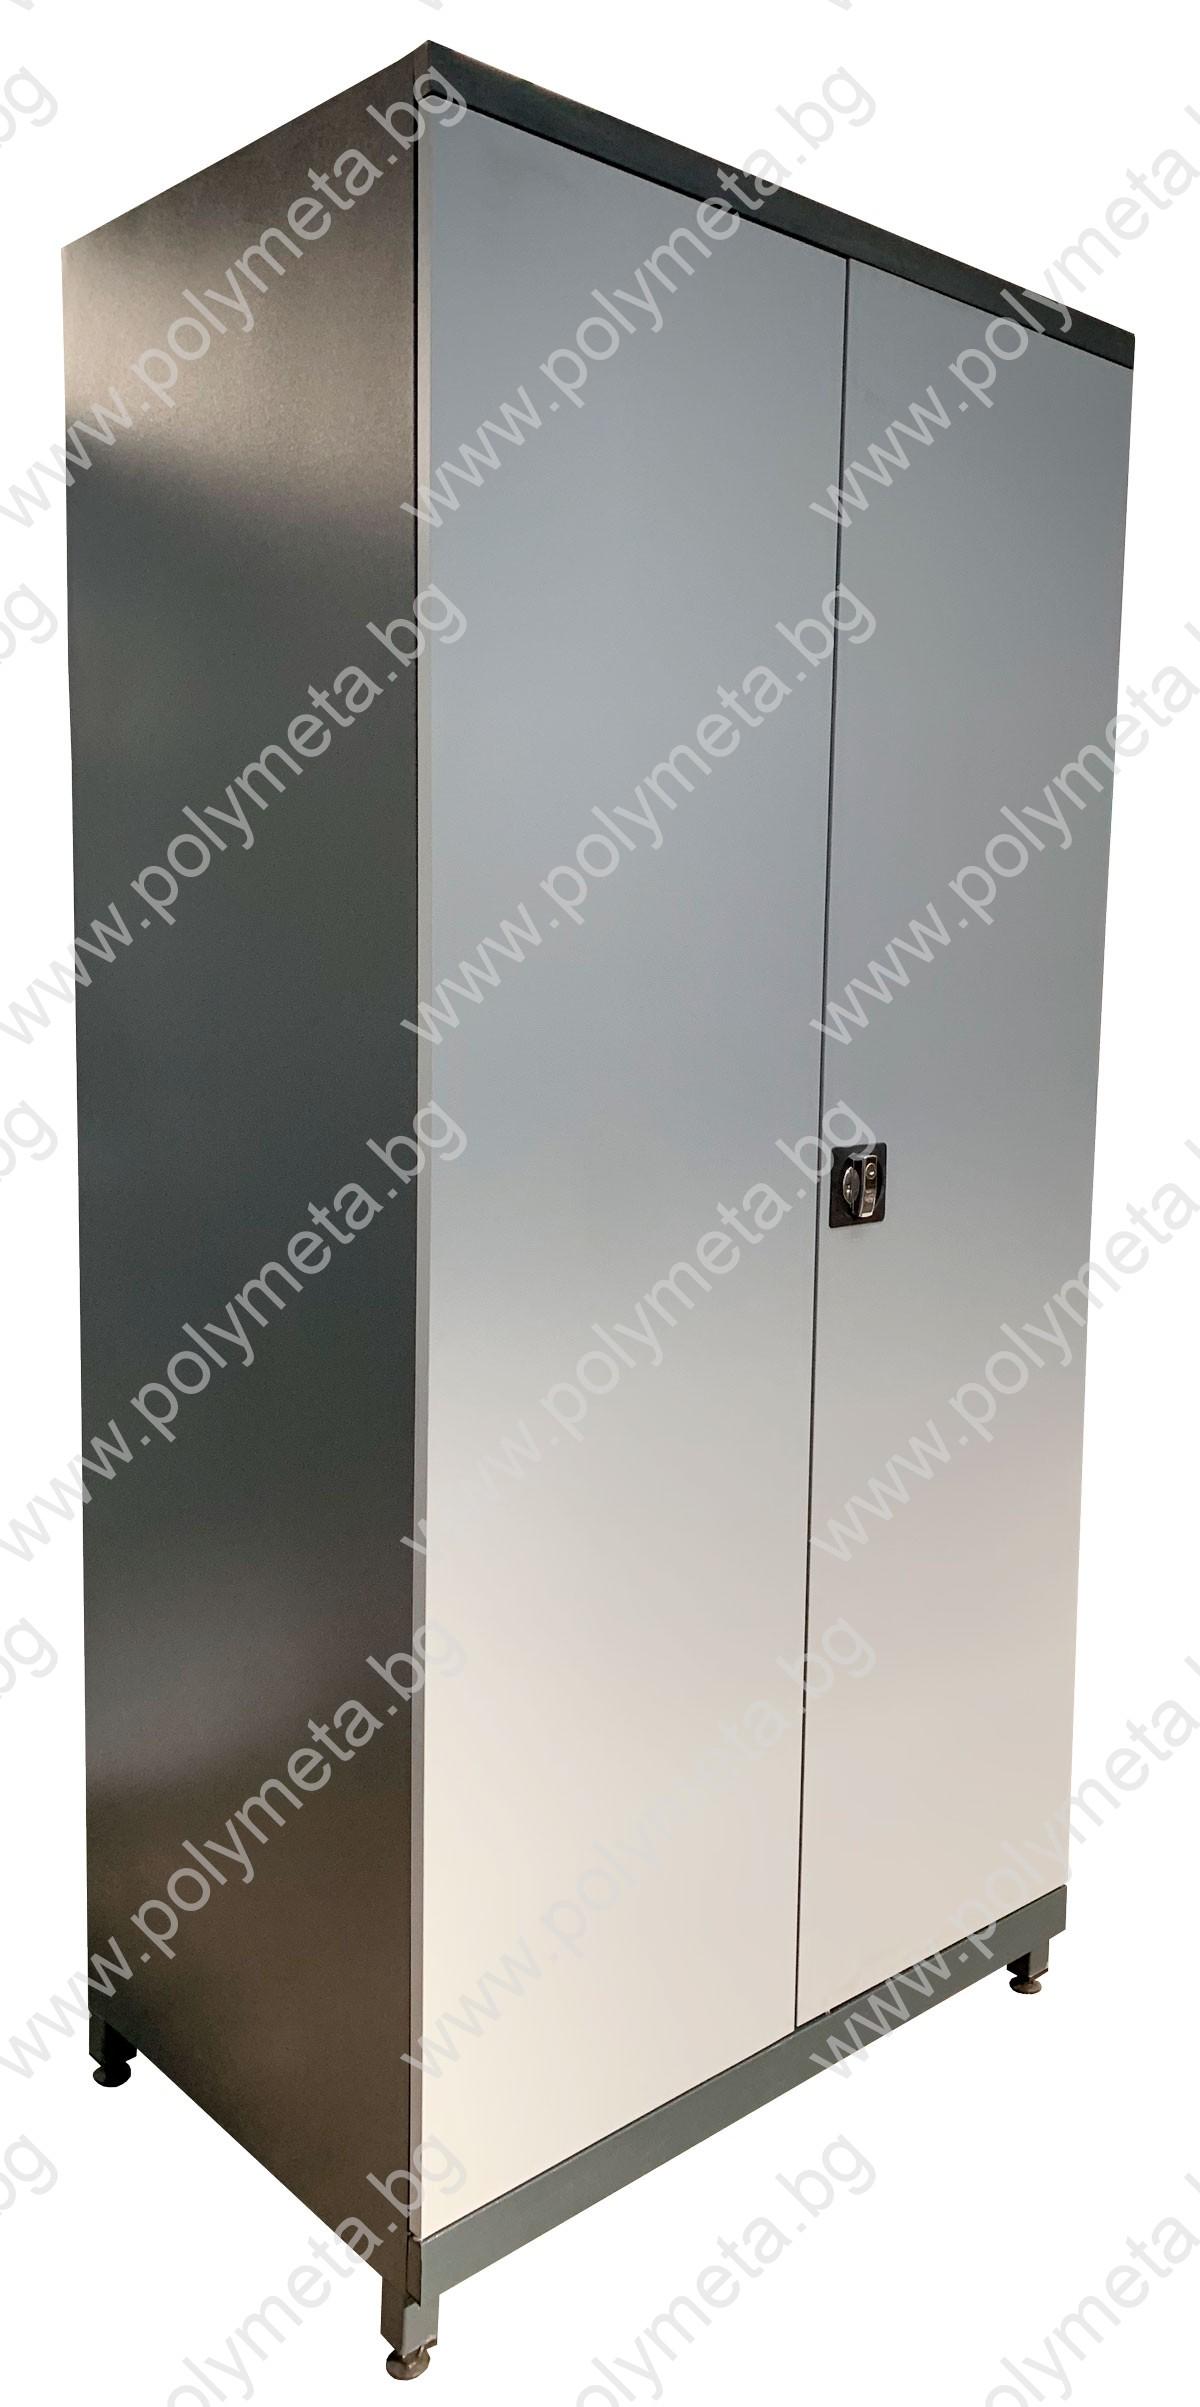 Голям инструментален шкаф Bodur